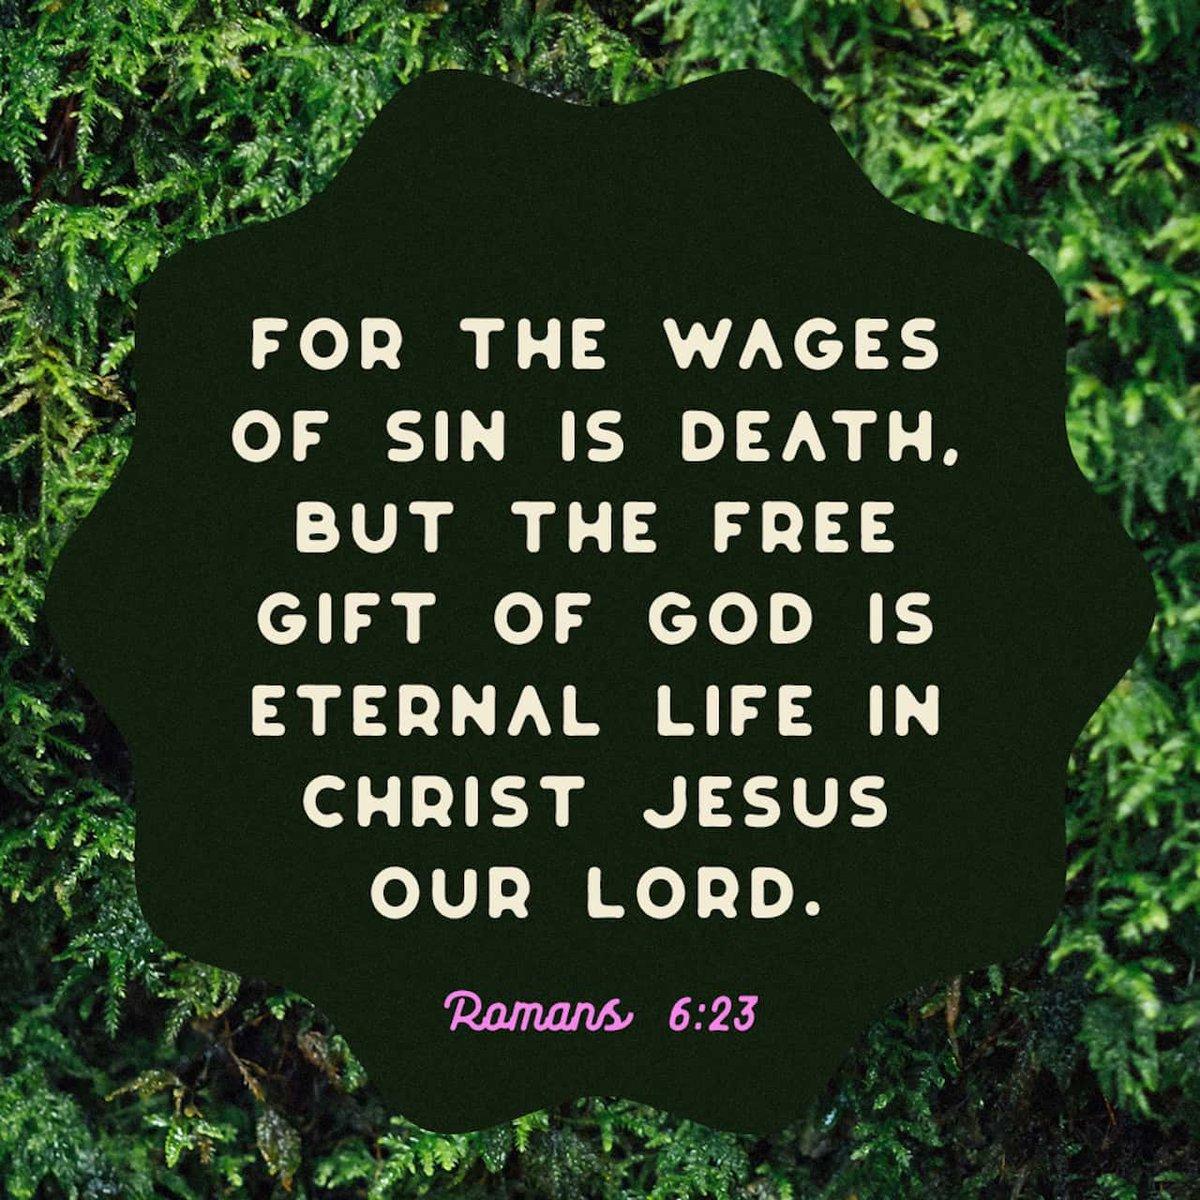 #GodIsLove #JesusIsLord #KingOfKings #PrinceOfPeace #Christianity #HisLawIsLove #LordOfAll #LionOfJudah #ForgivenAndFree #Yahweh #Gospel #Savior #Scripture #Yeshua #SalvationForAll #GraceWins #GoodNews #SeekTruth #BibleHabit #WeekendWisdom  https://t.co/lNeIllnko1 https://t.co/G9OjkhbsKH